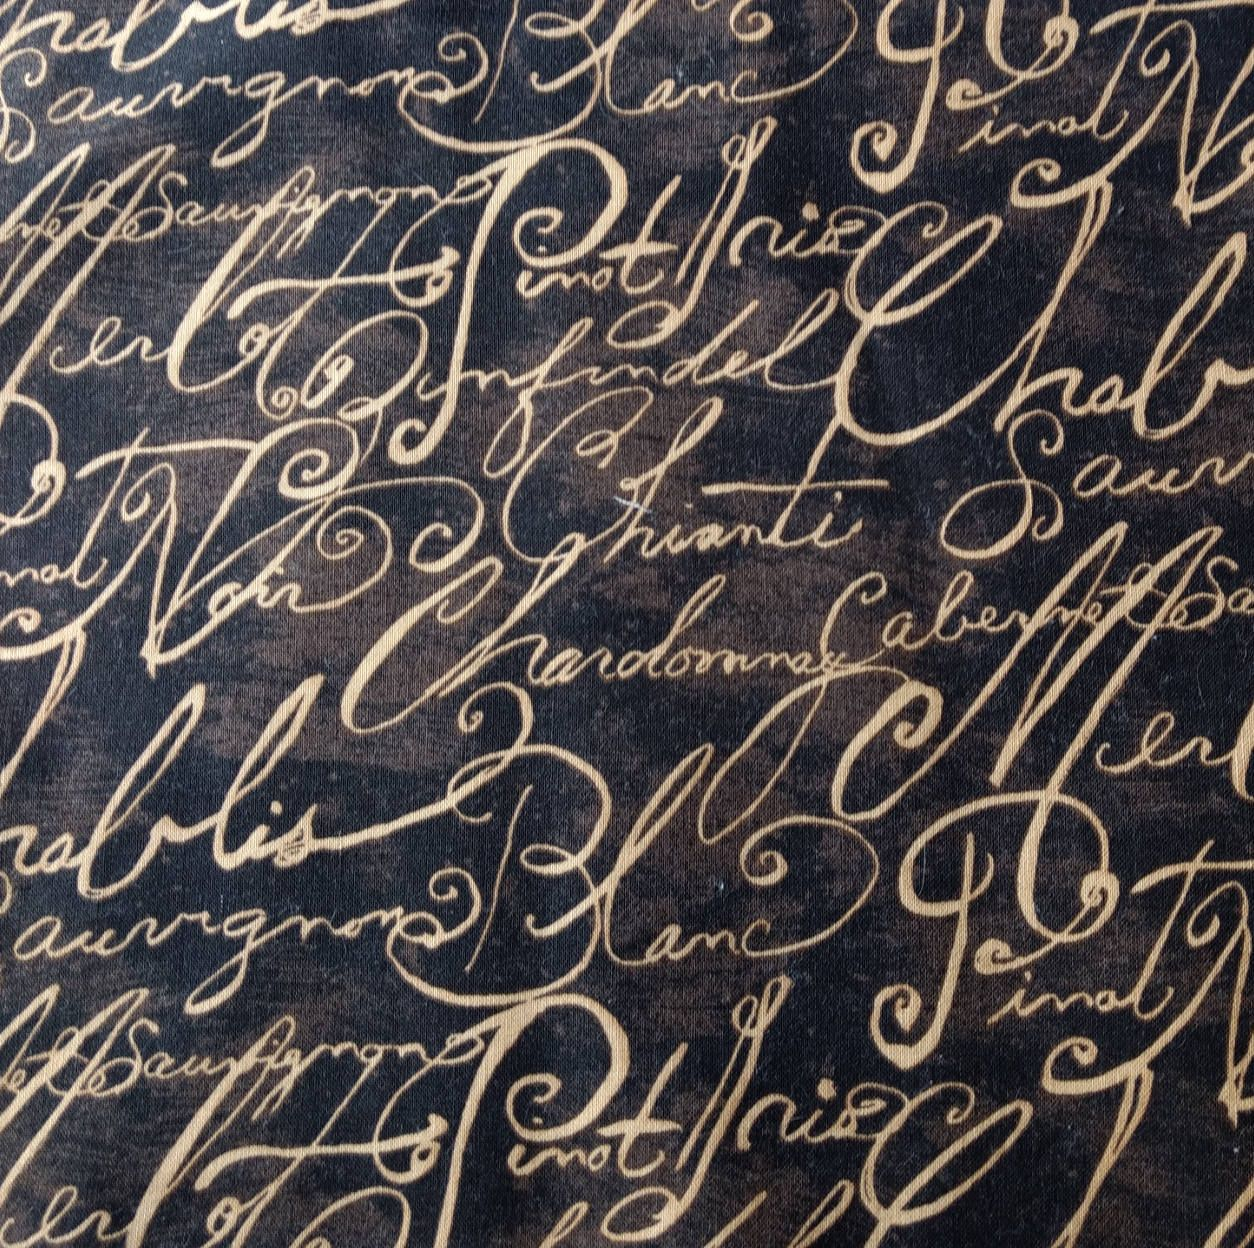 art design mode en patchwork textile quilt neckties photo flooring images material silk pattern man quilting free